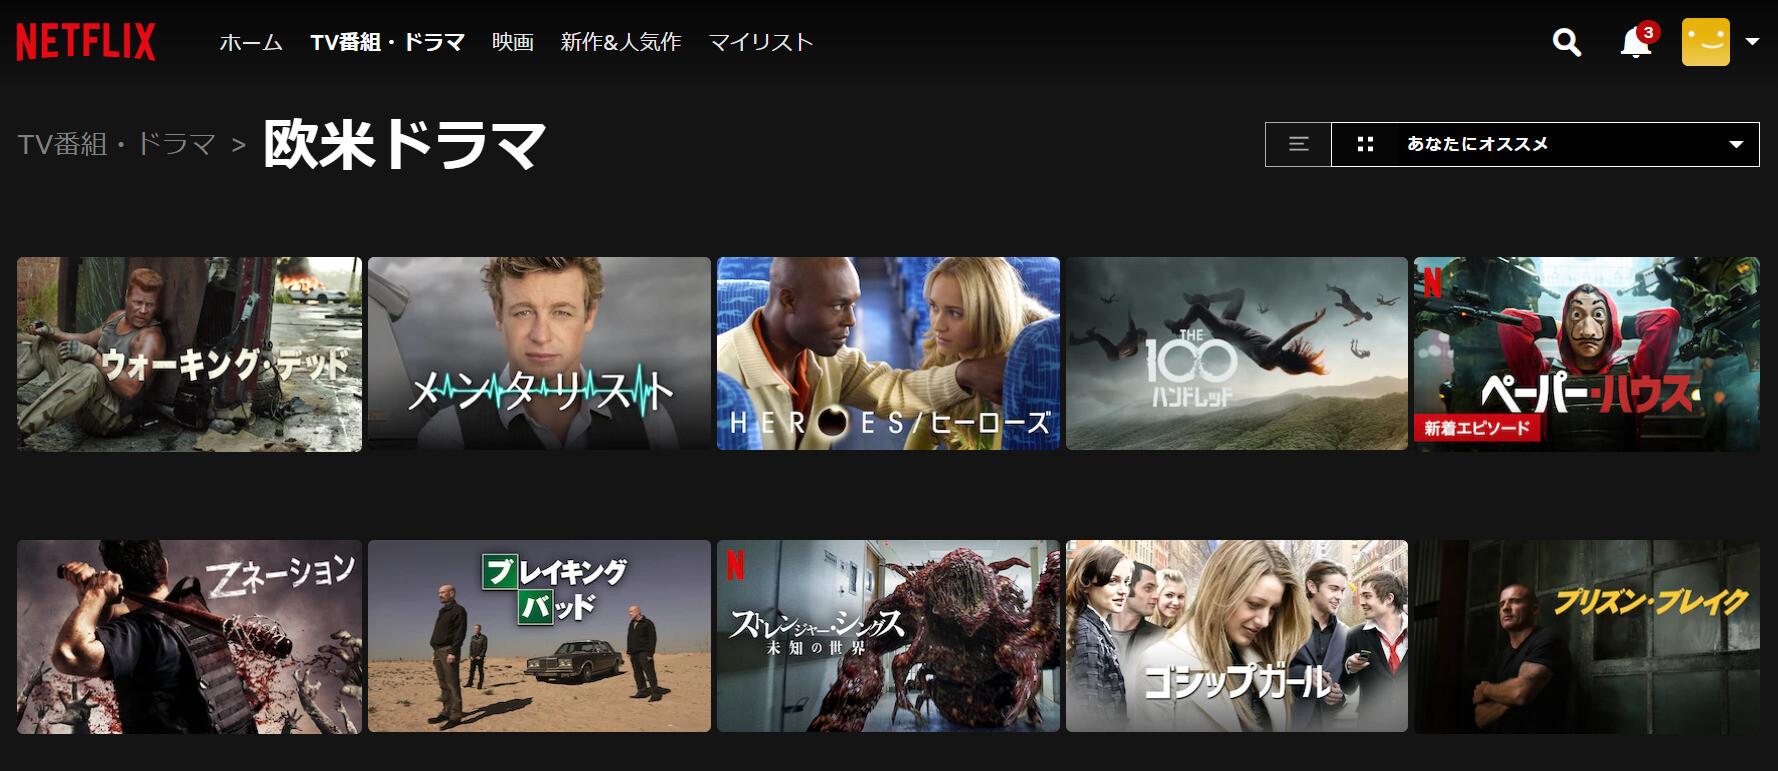 Netflixの欧米ドラマのラインナップ例